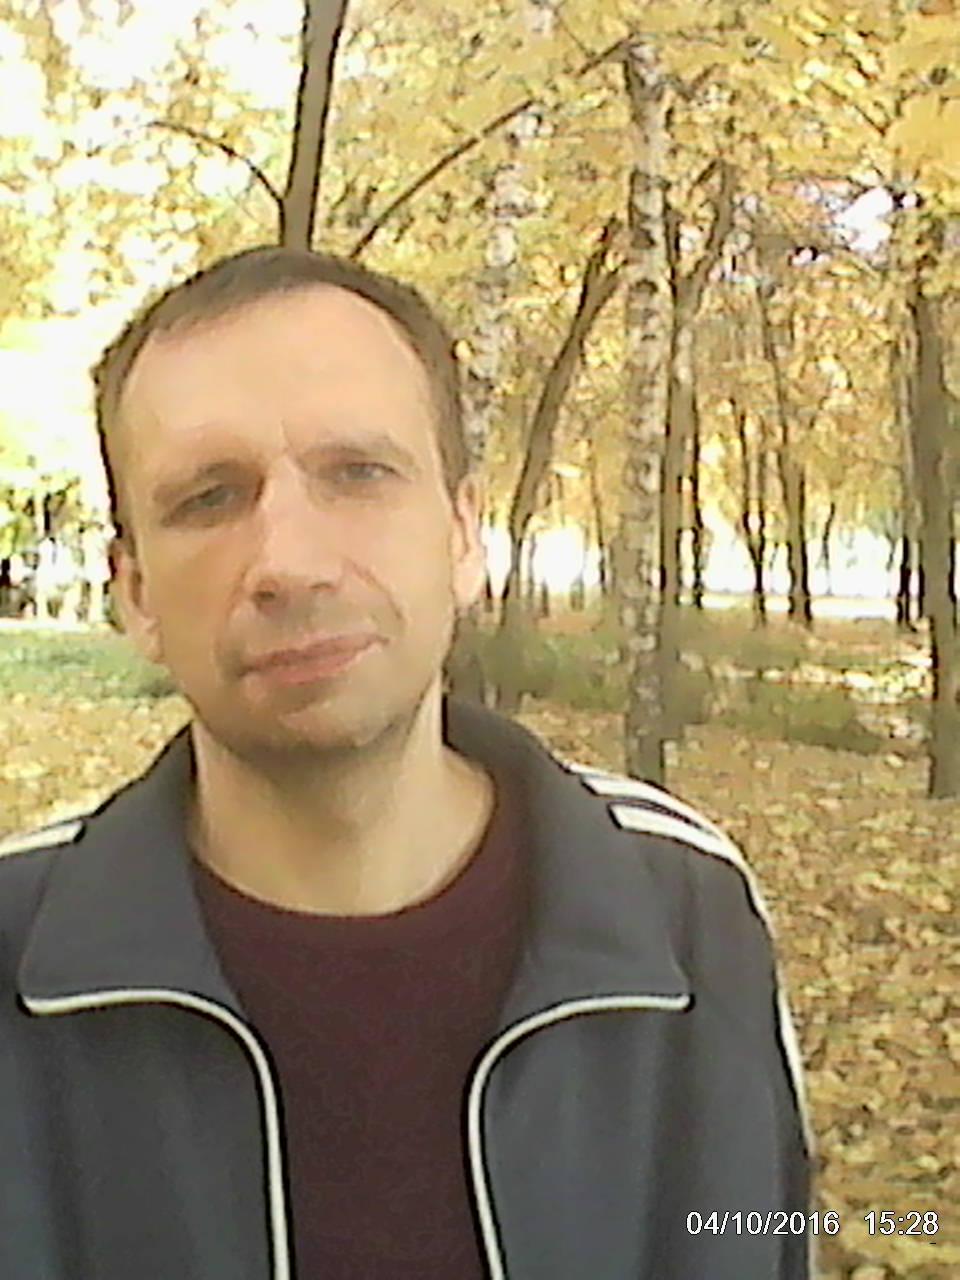 Владимир знакомств отзывы служба г. форум